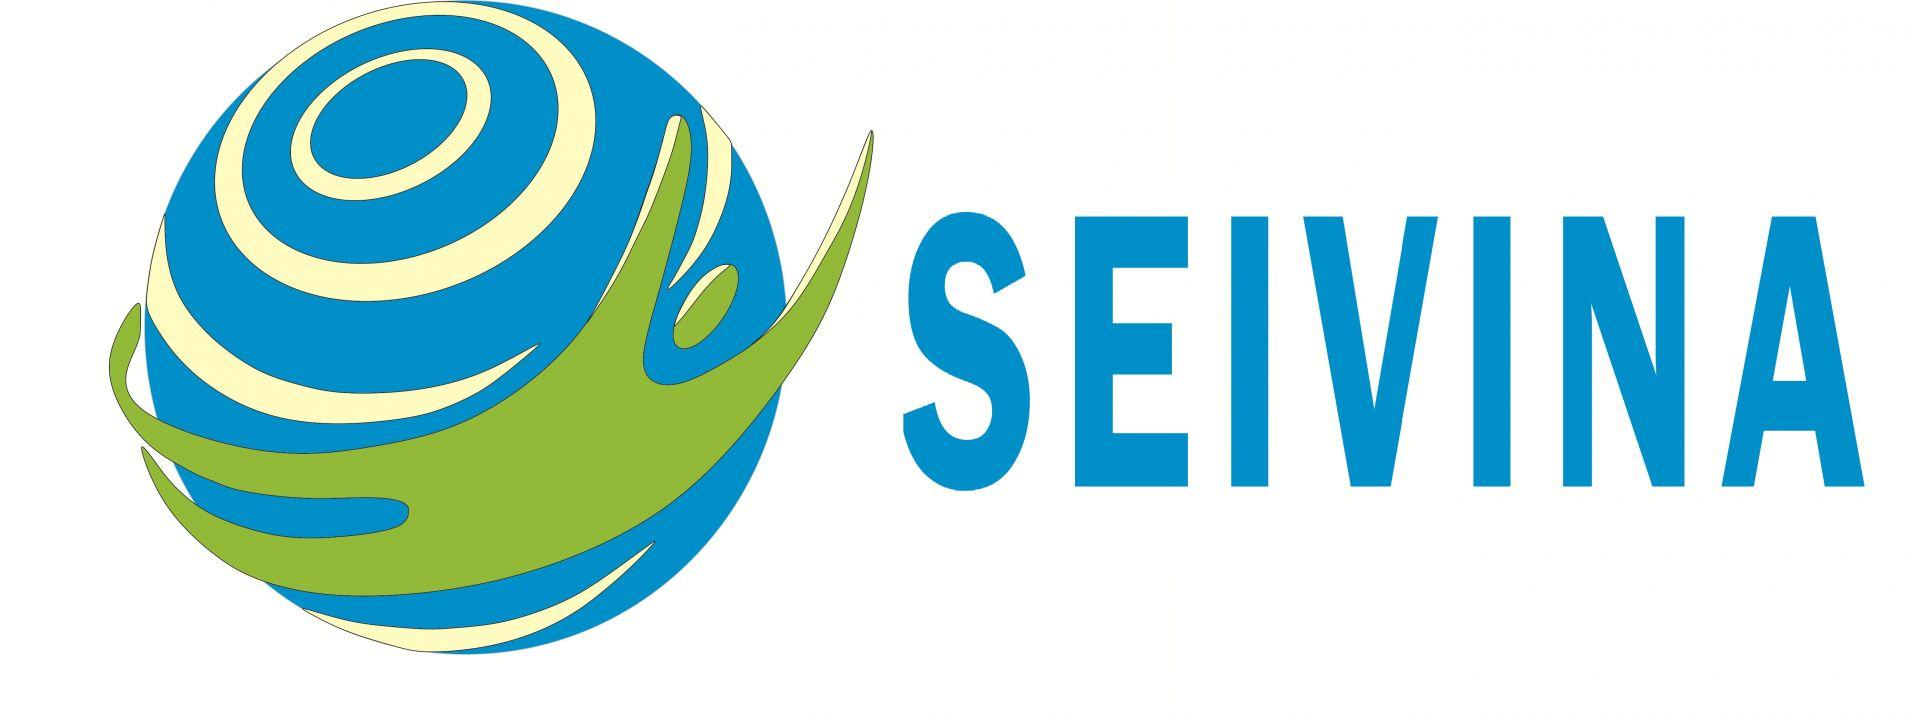 SEIVINA - Export of consumer goods